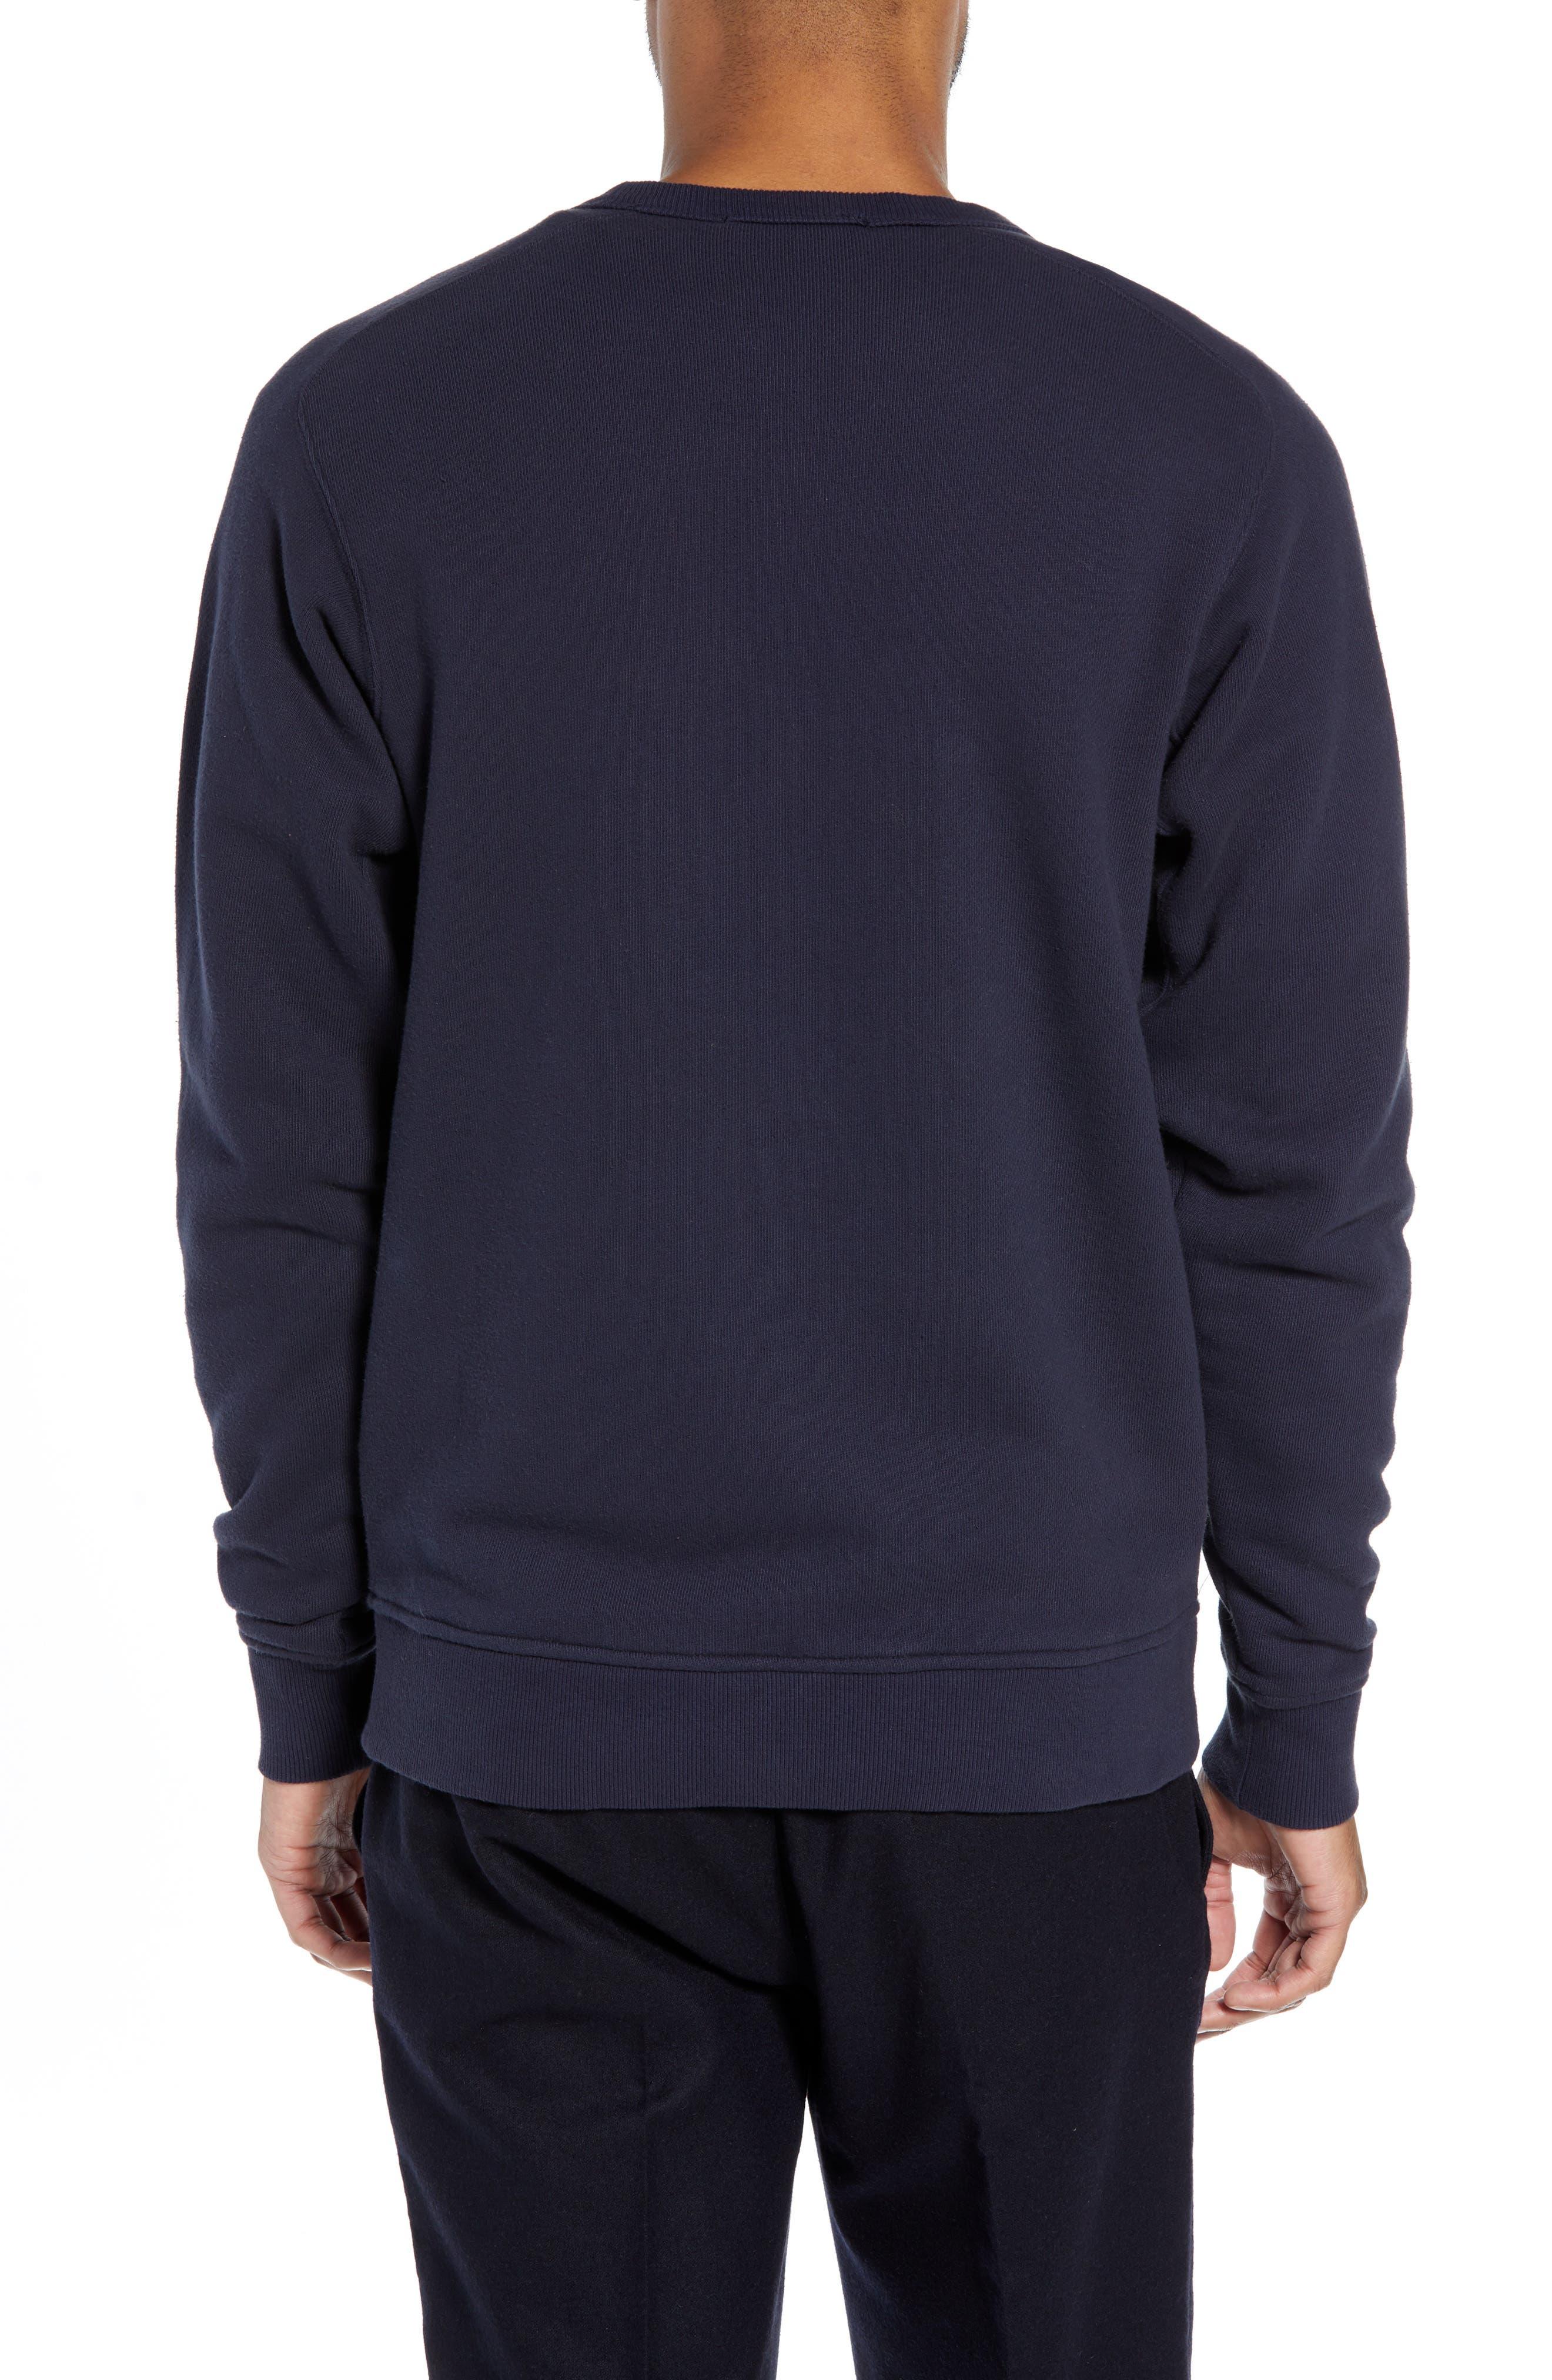 Almost Grown Crewneck Sweatshirt,                             Alternate thumbnail 2, color,                             NAVY